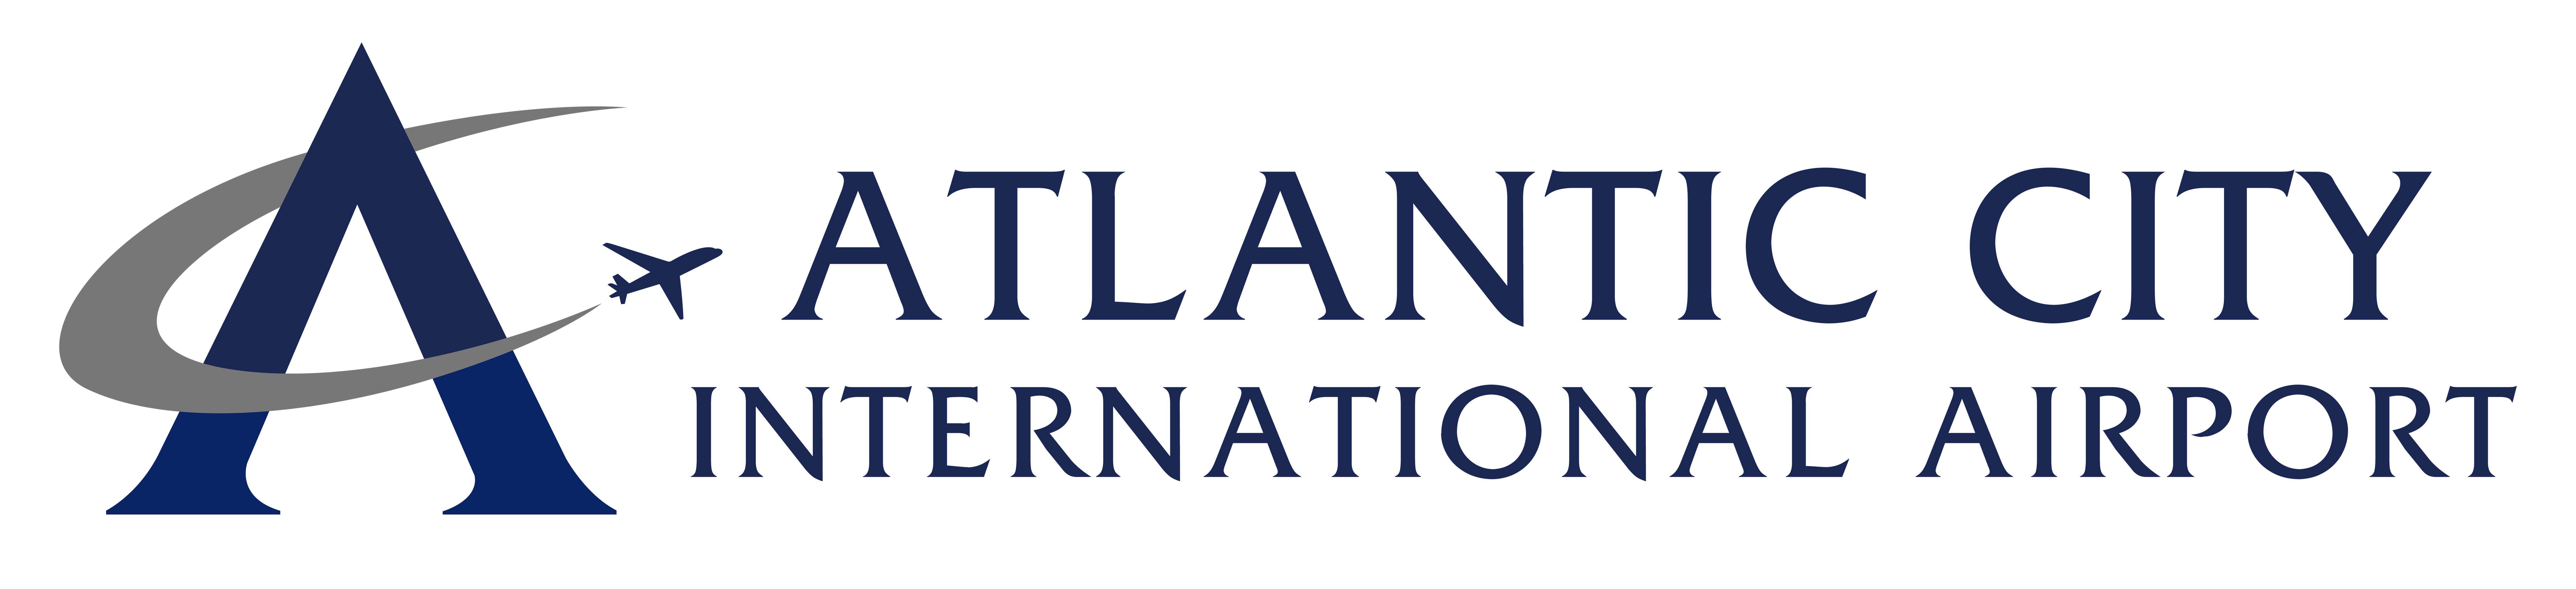 Atlantic City International Airport uses Aerosimple airport operations